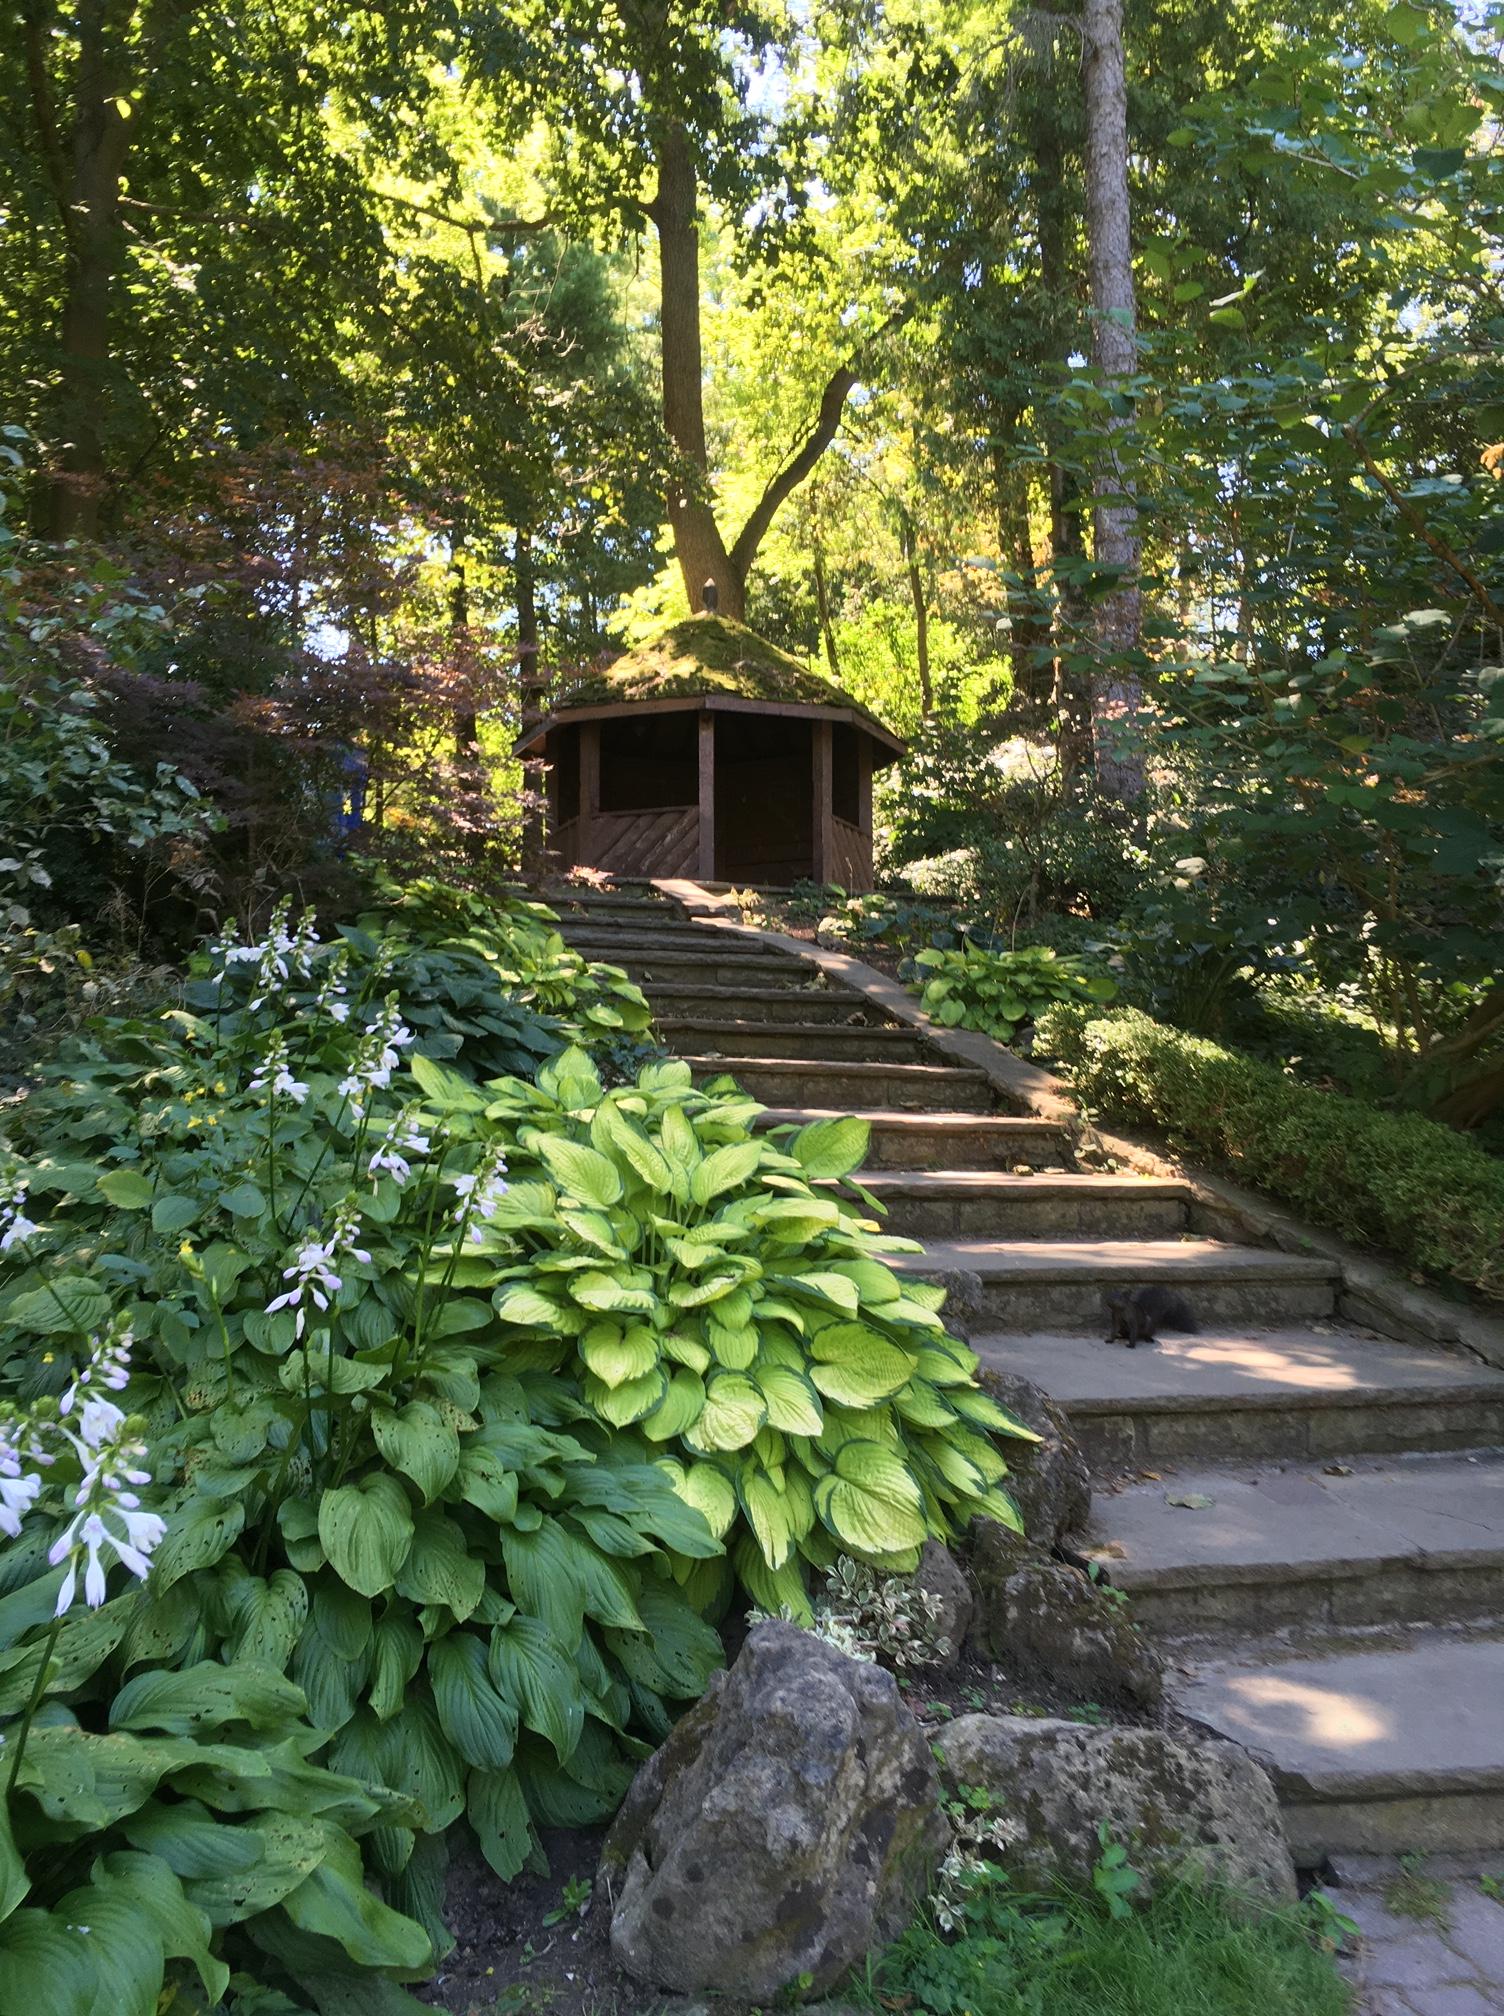 Toronto Botanical Garden steps